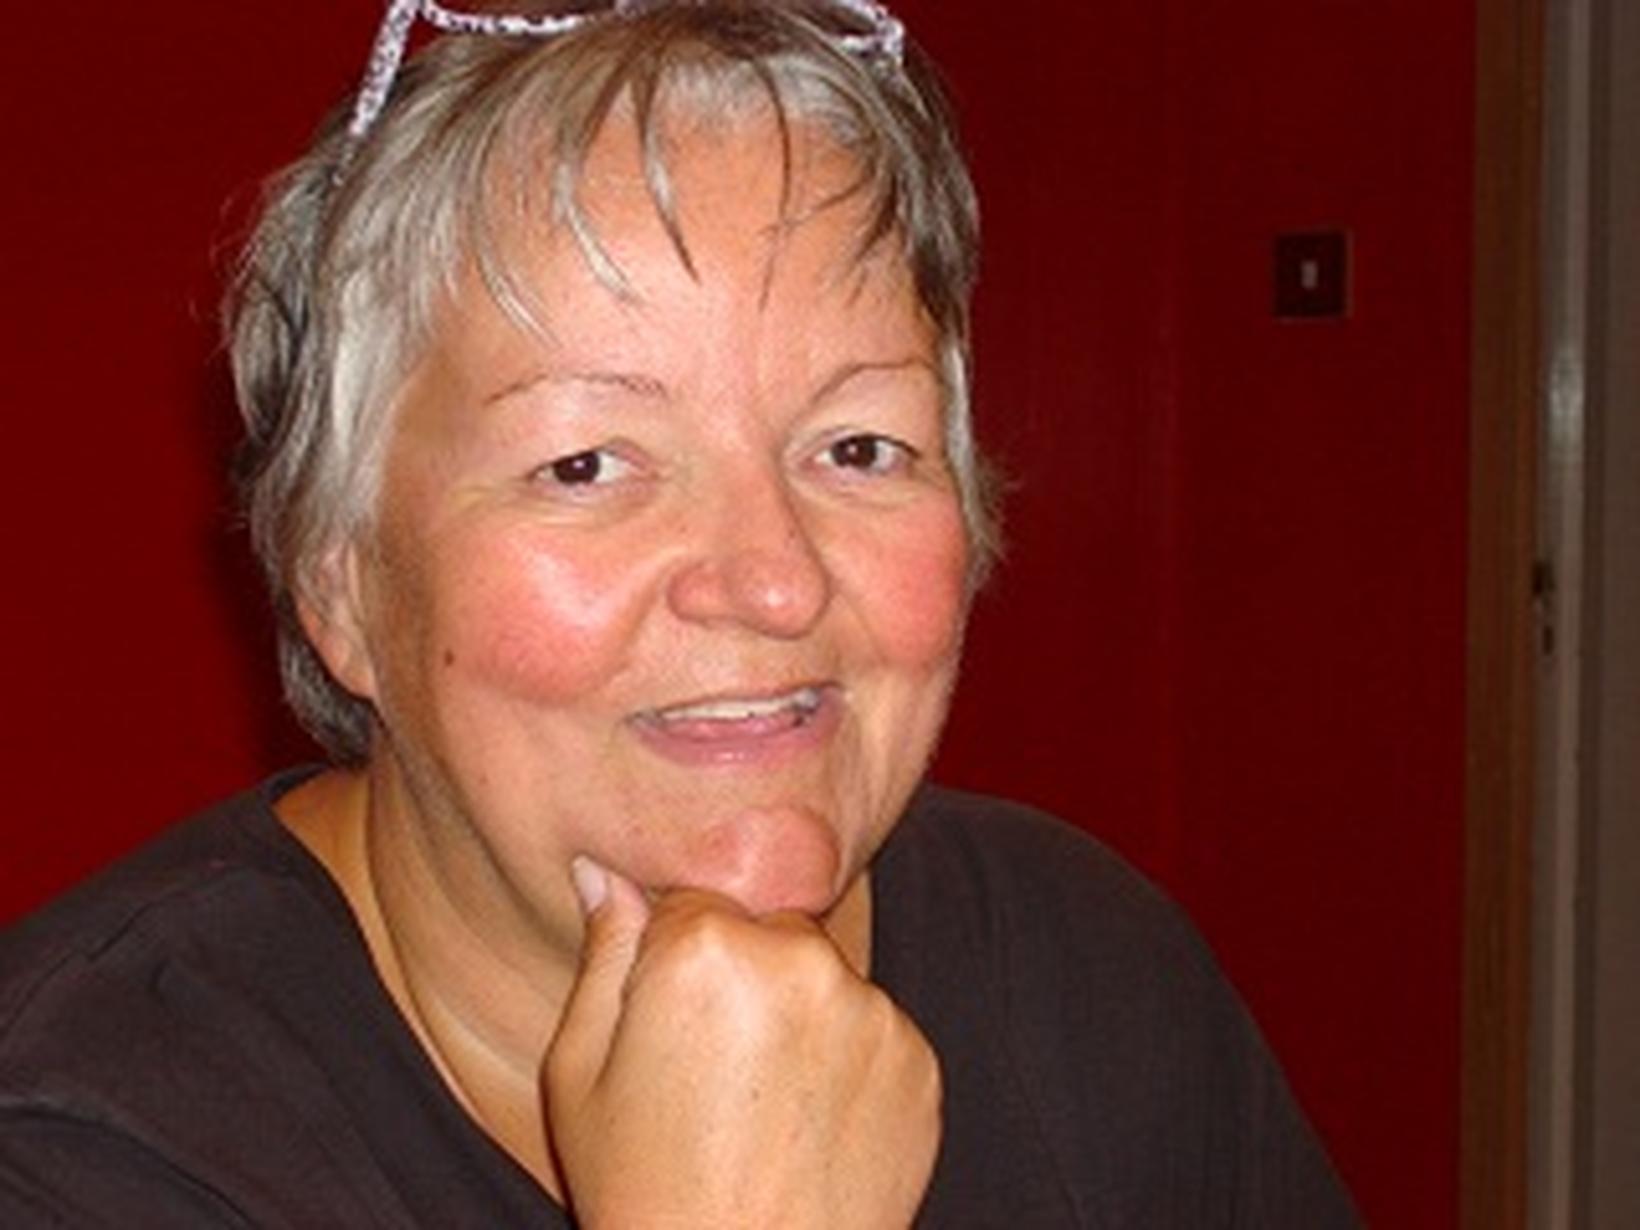 Judith from London, United Kingdom